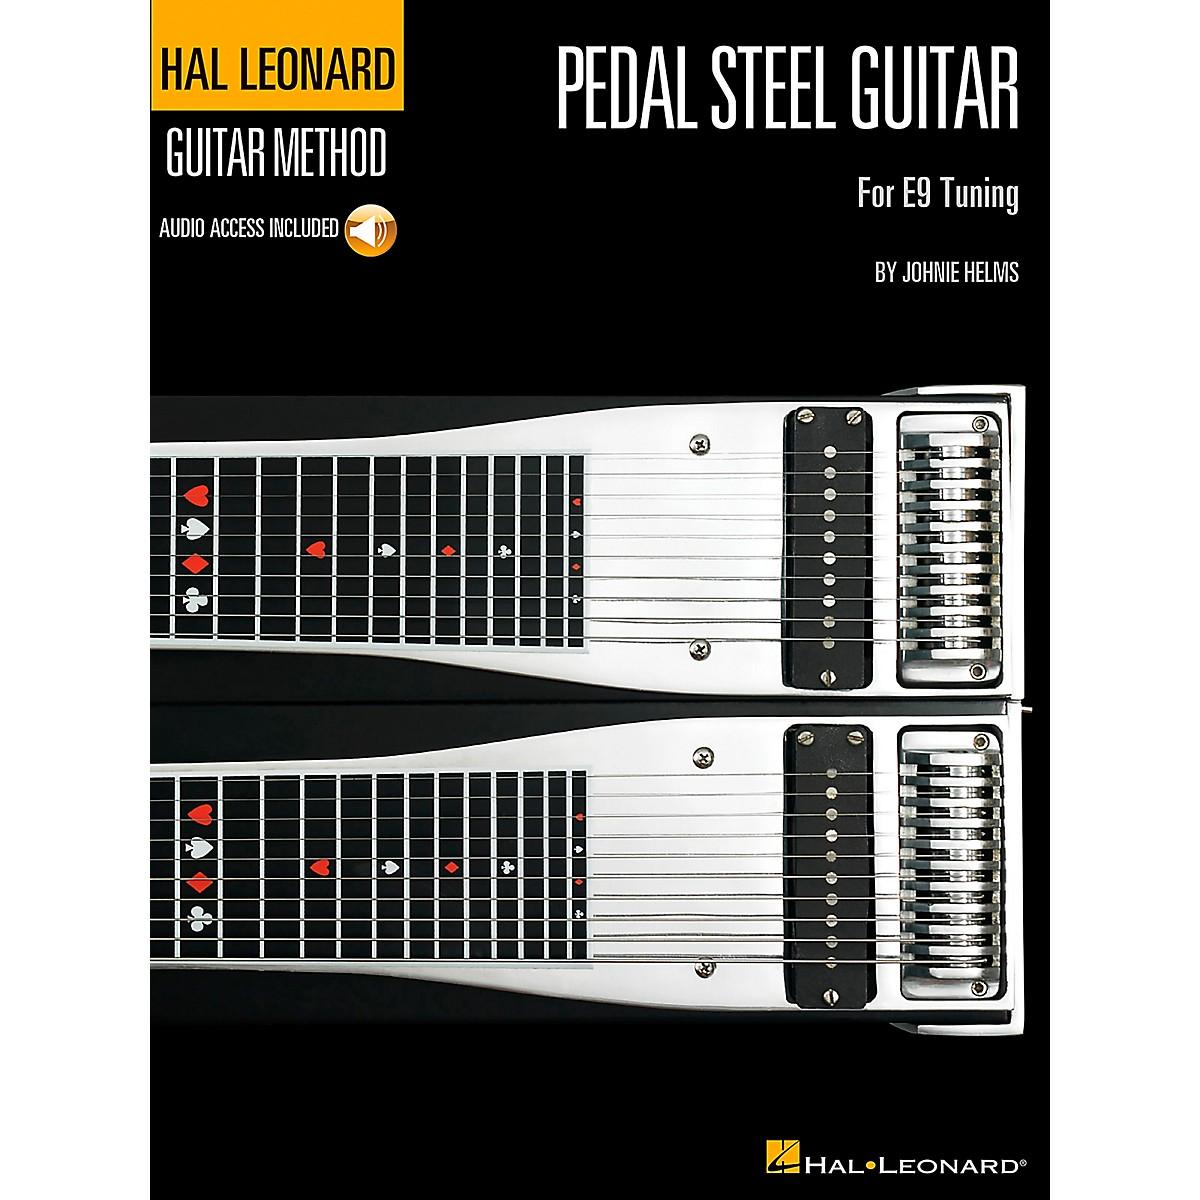 Hal Leonard Guitar Method Pedal Steel Guitar Book/CD for E9 Tuning